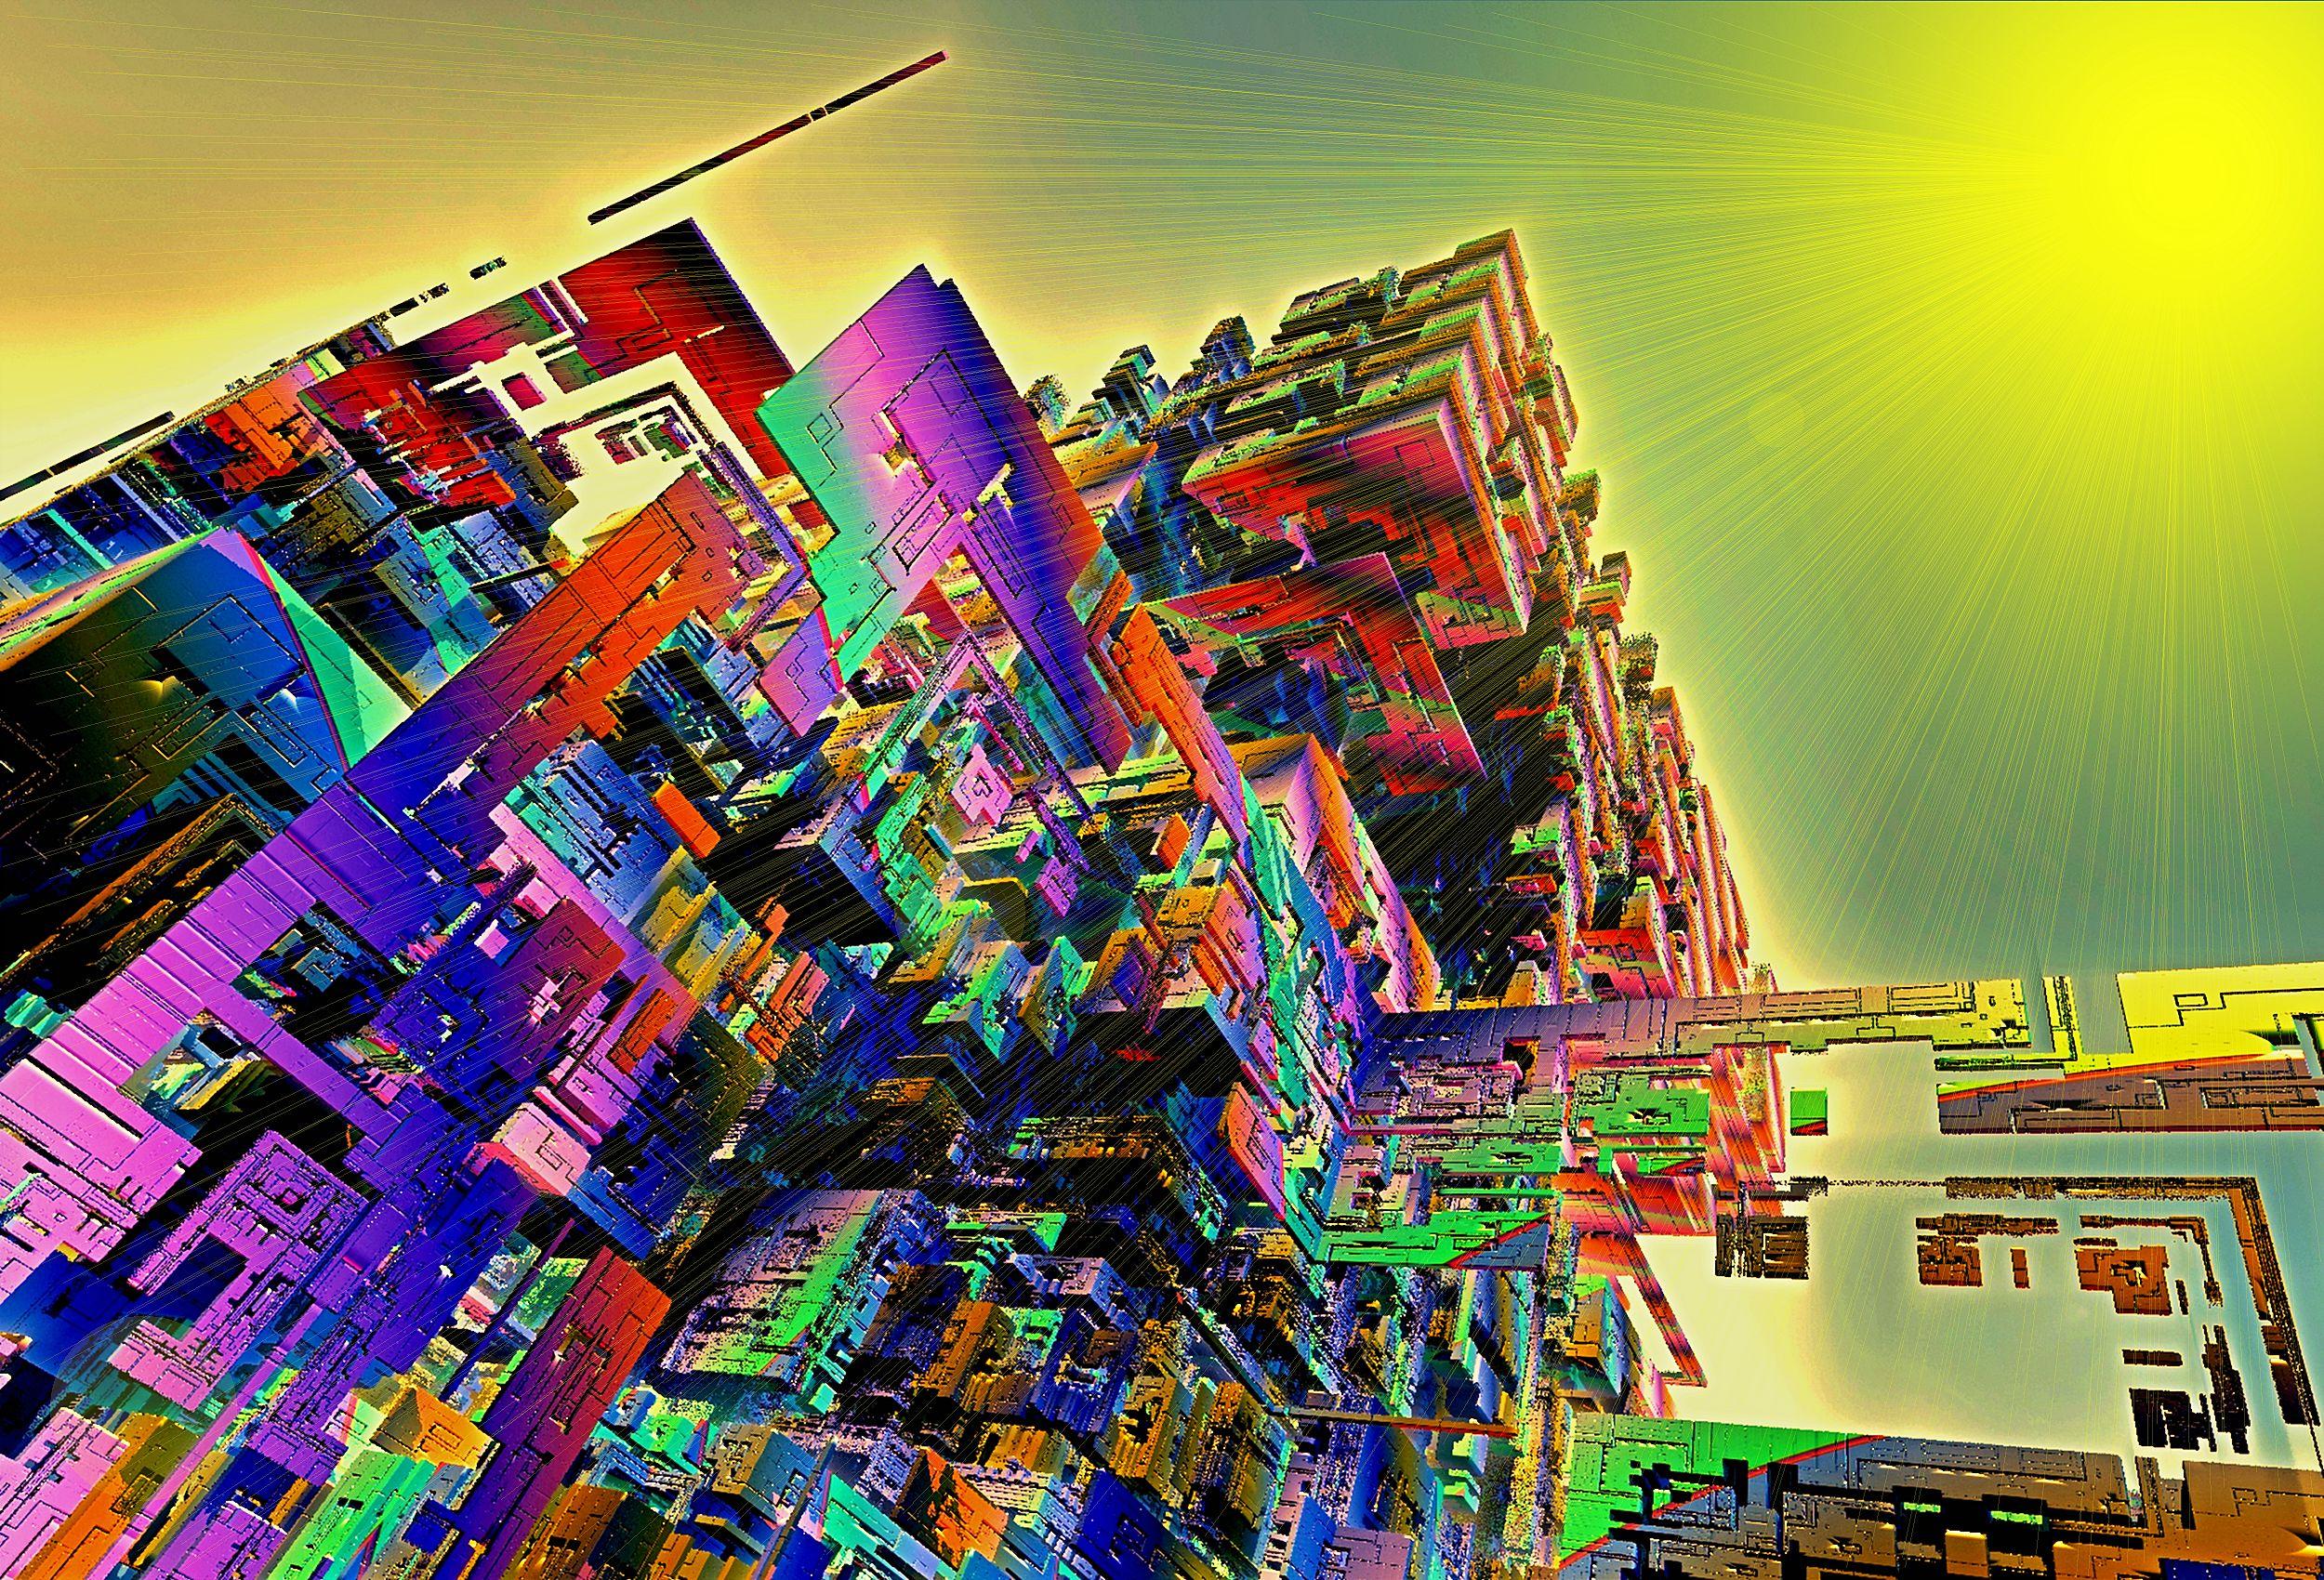 ColorScraper by montag451